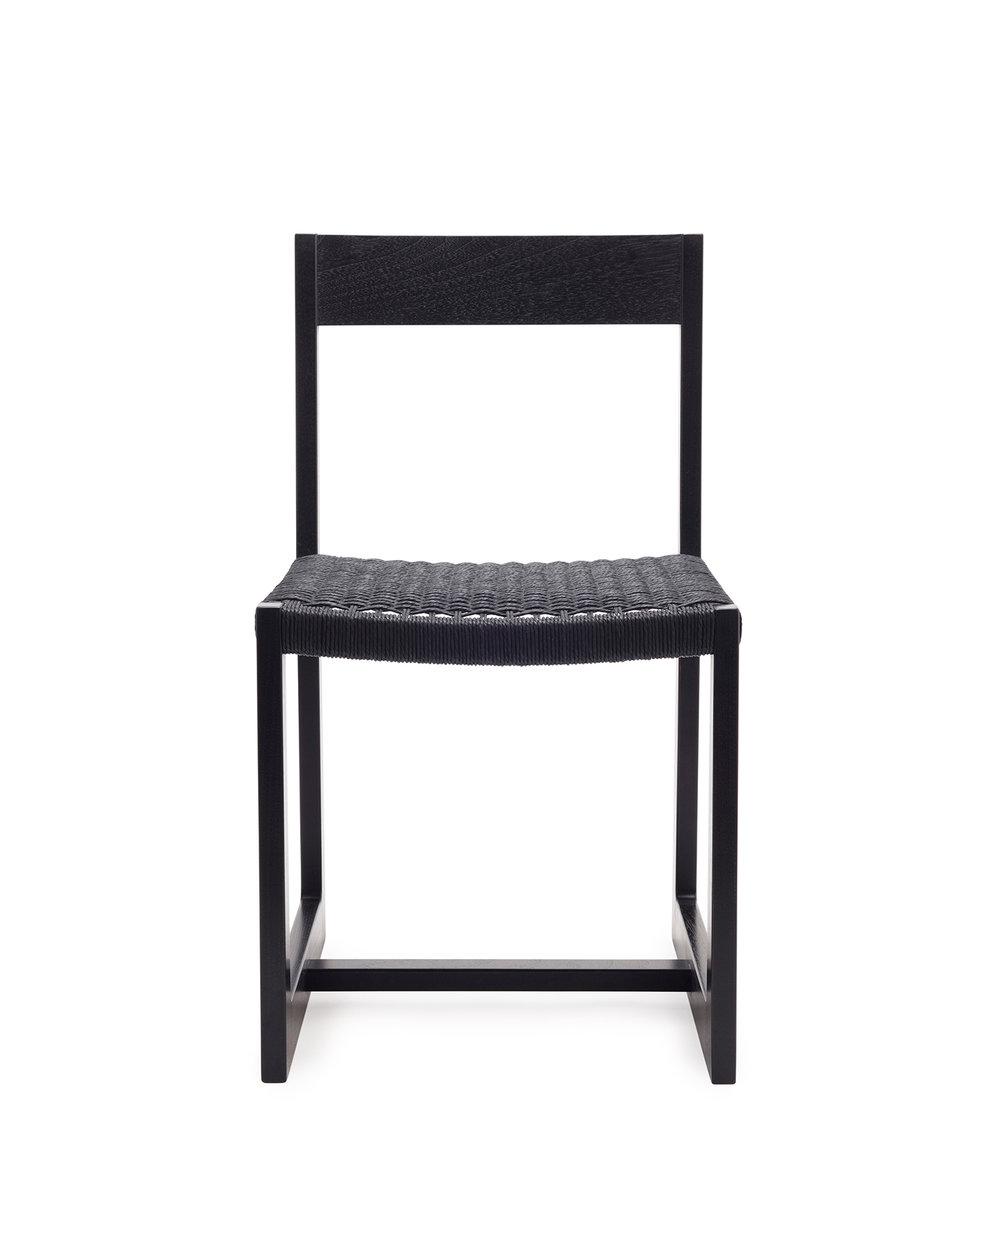 Matteawan chair in ebonized walnut and black Danish cord